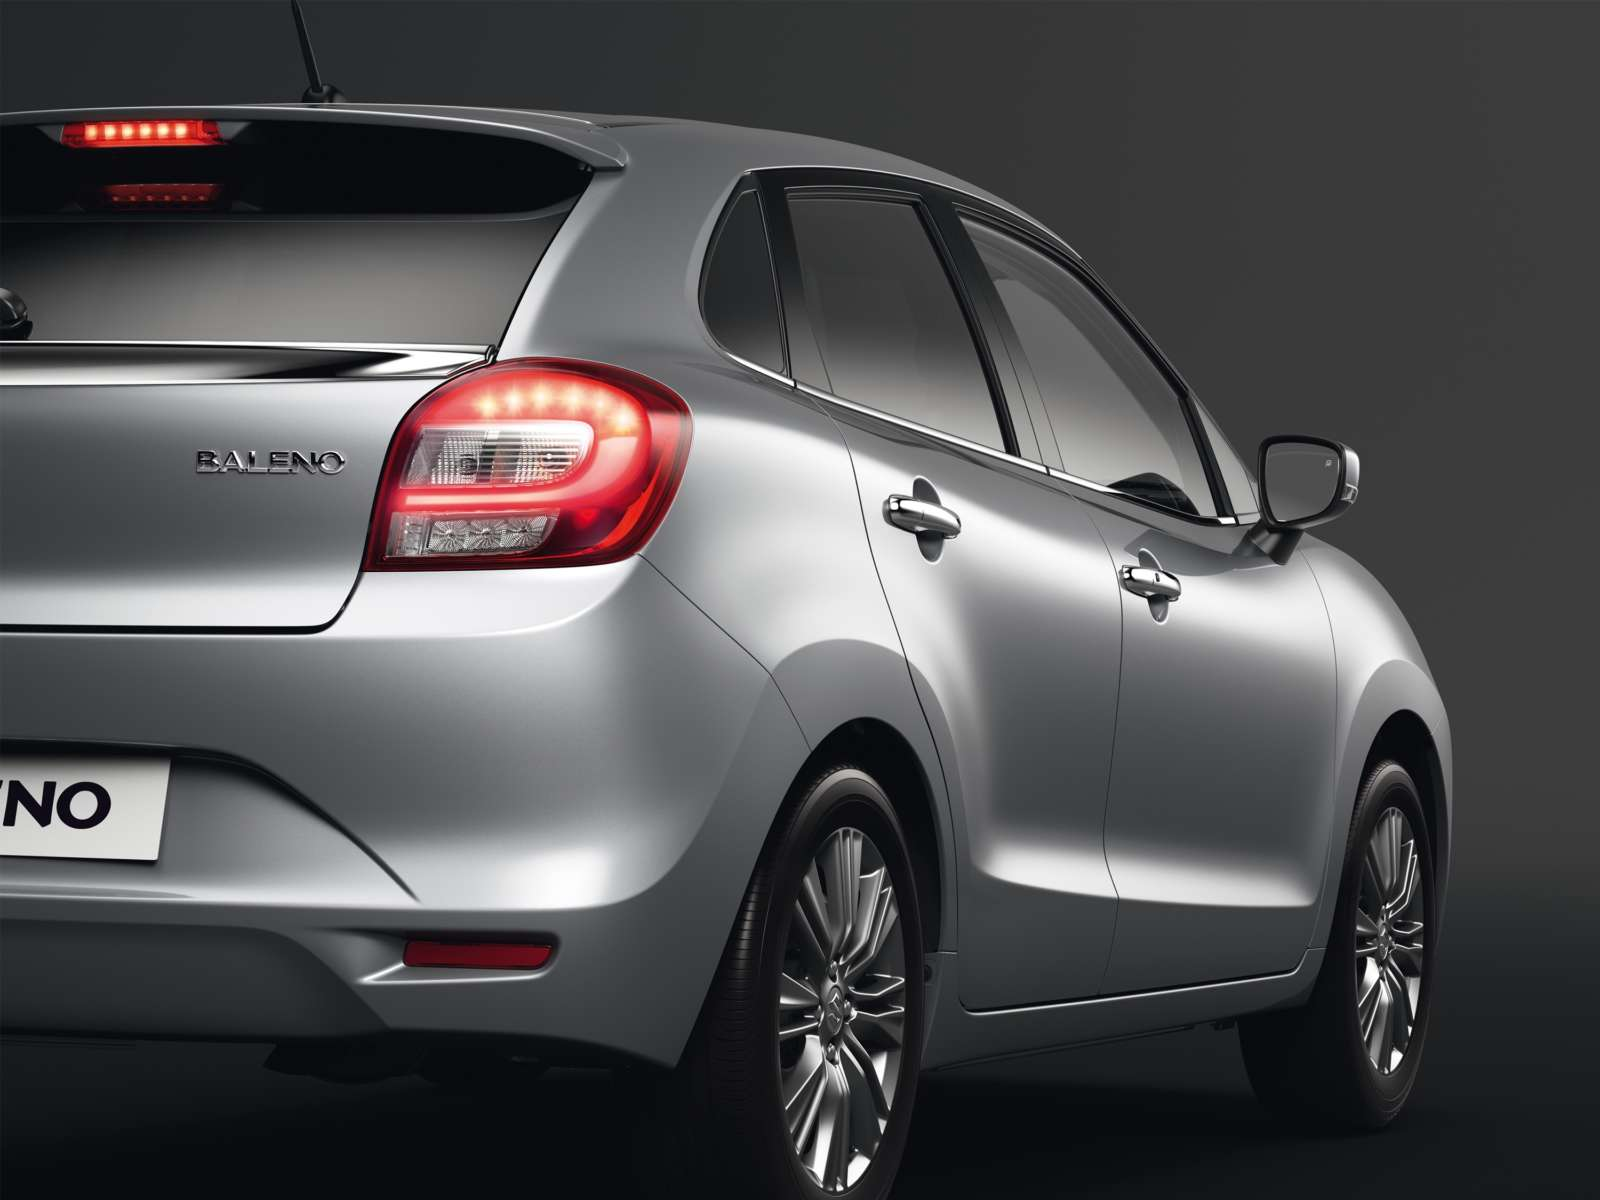 Frankfurt Motor Show 2015 : New Suzuki Baleno revealed